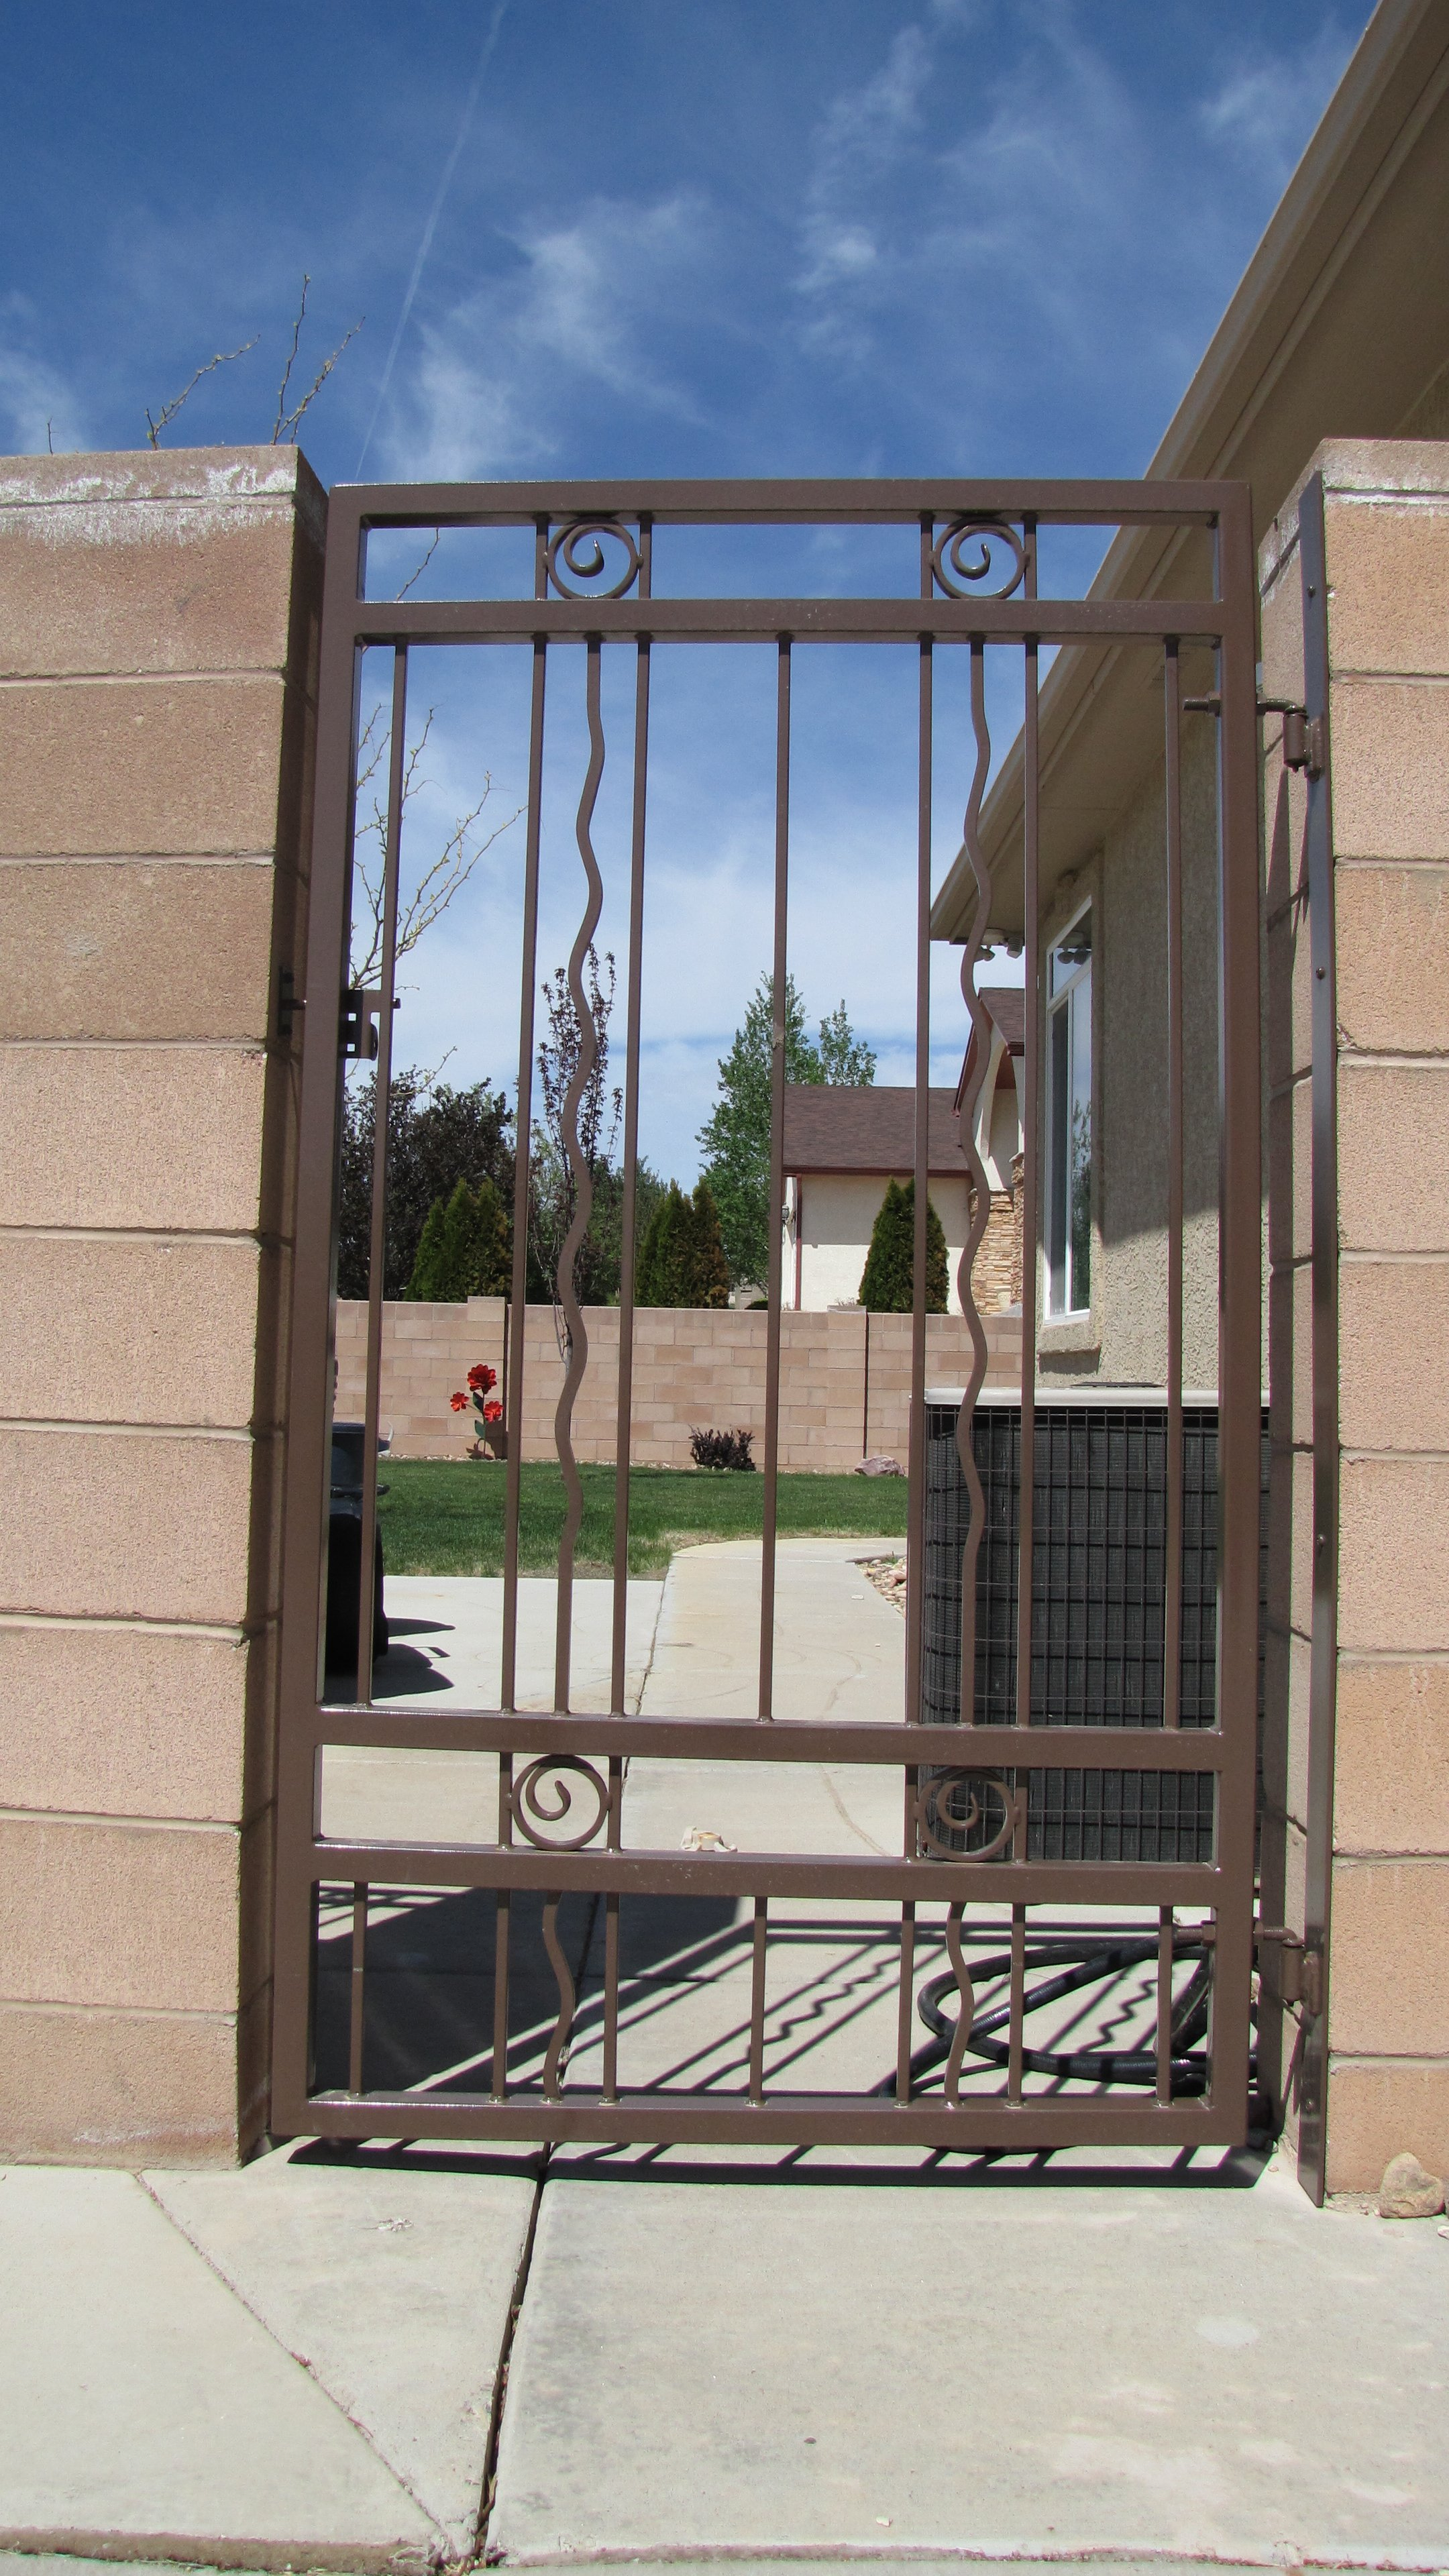 Trujillo fence and gates0003.JPG